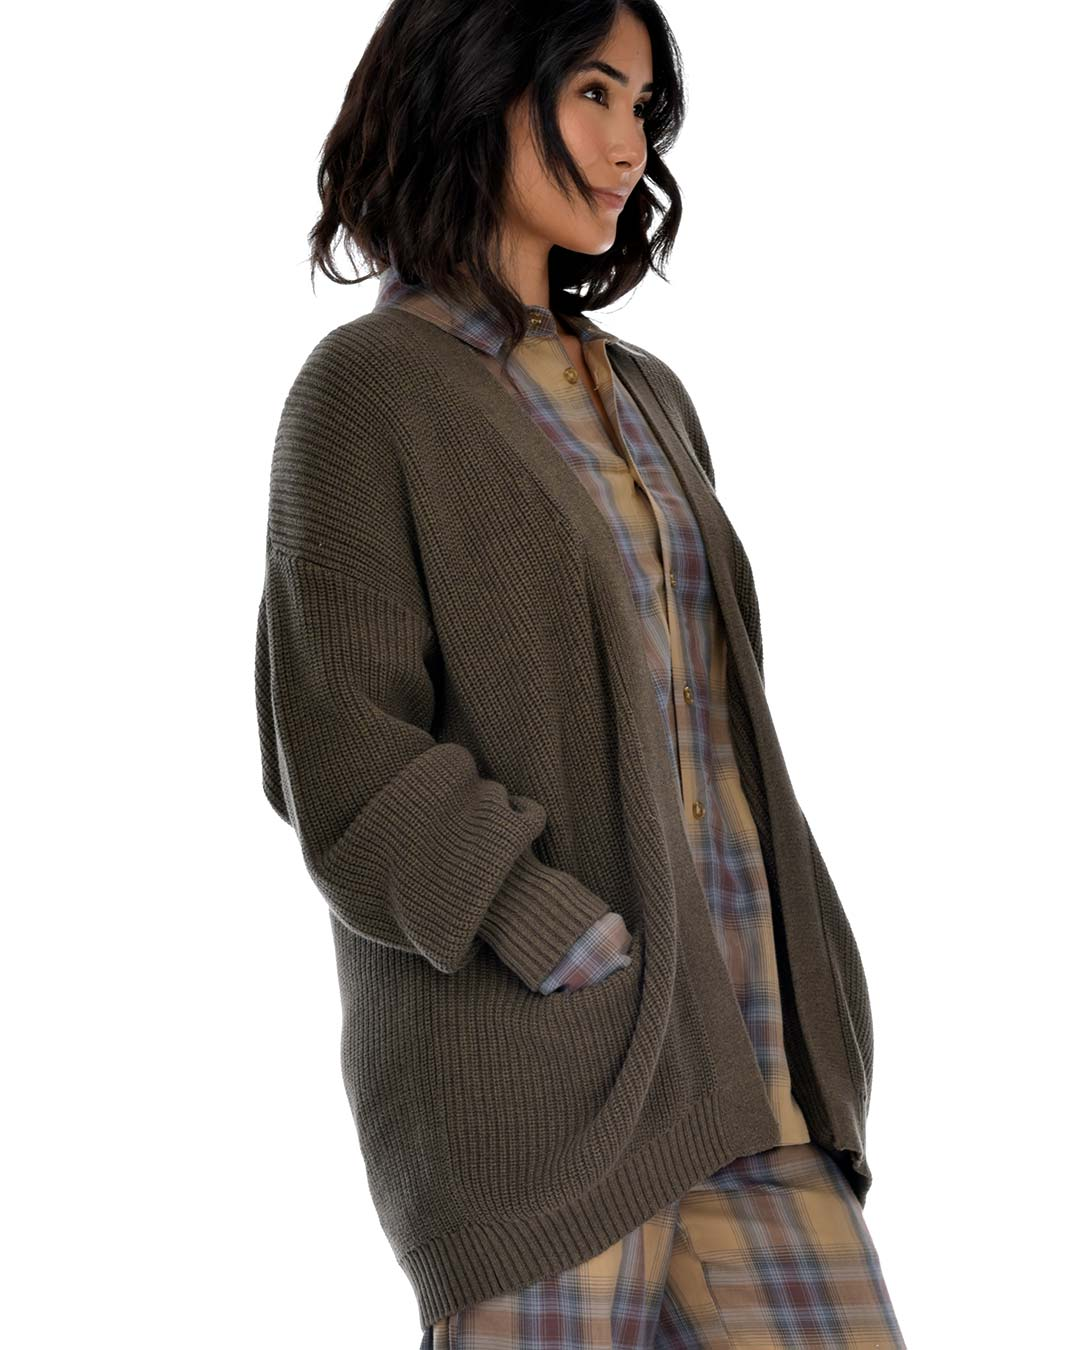 paper-label-opal-cardigan-fern-side-dianes-lingerie-vancouver-1080x1350